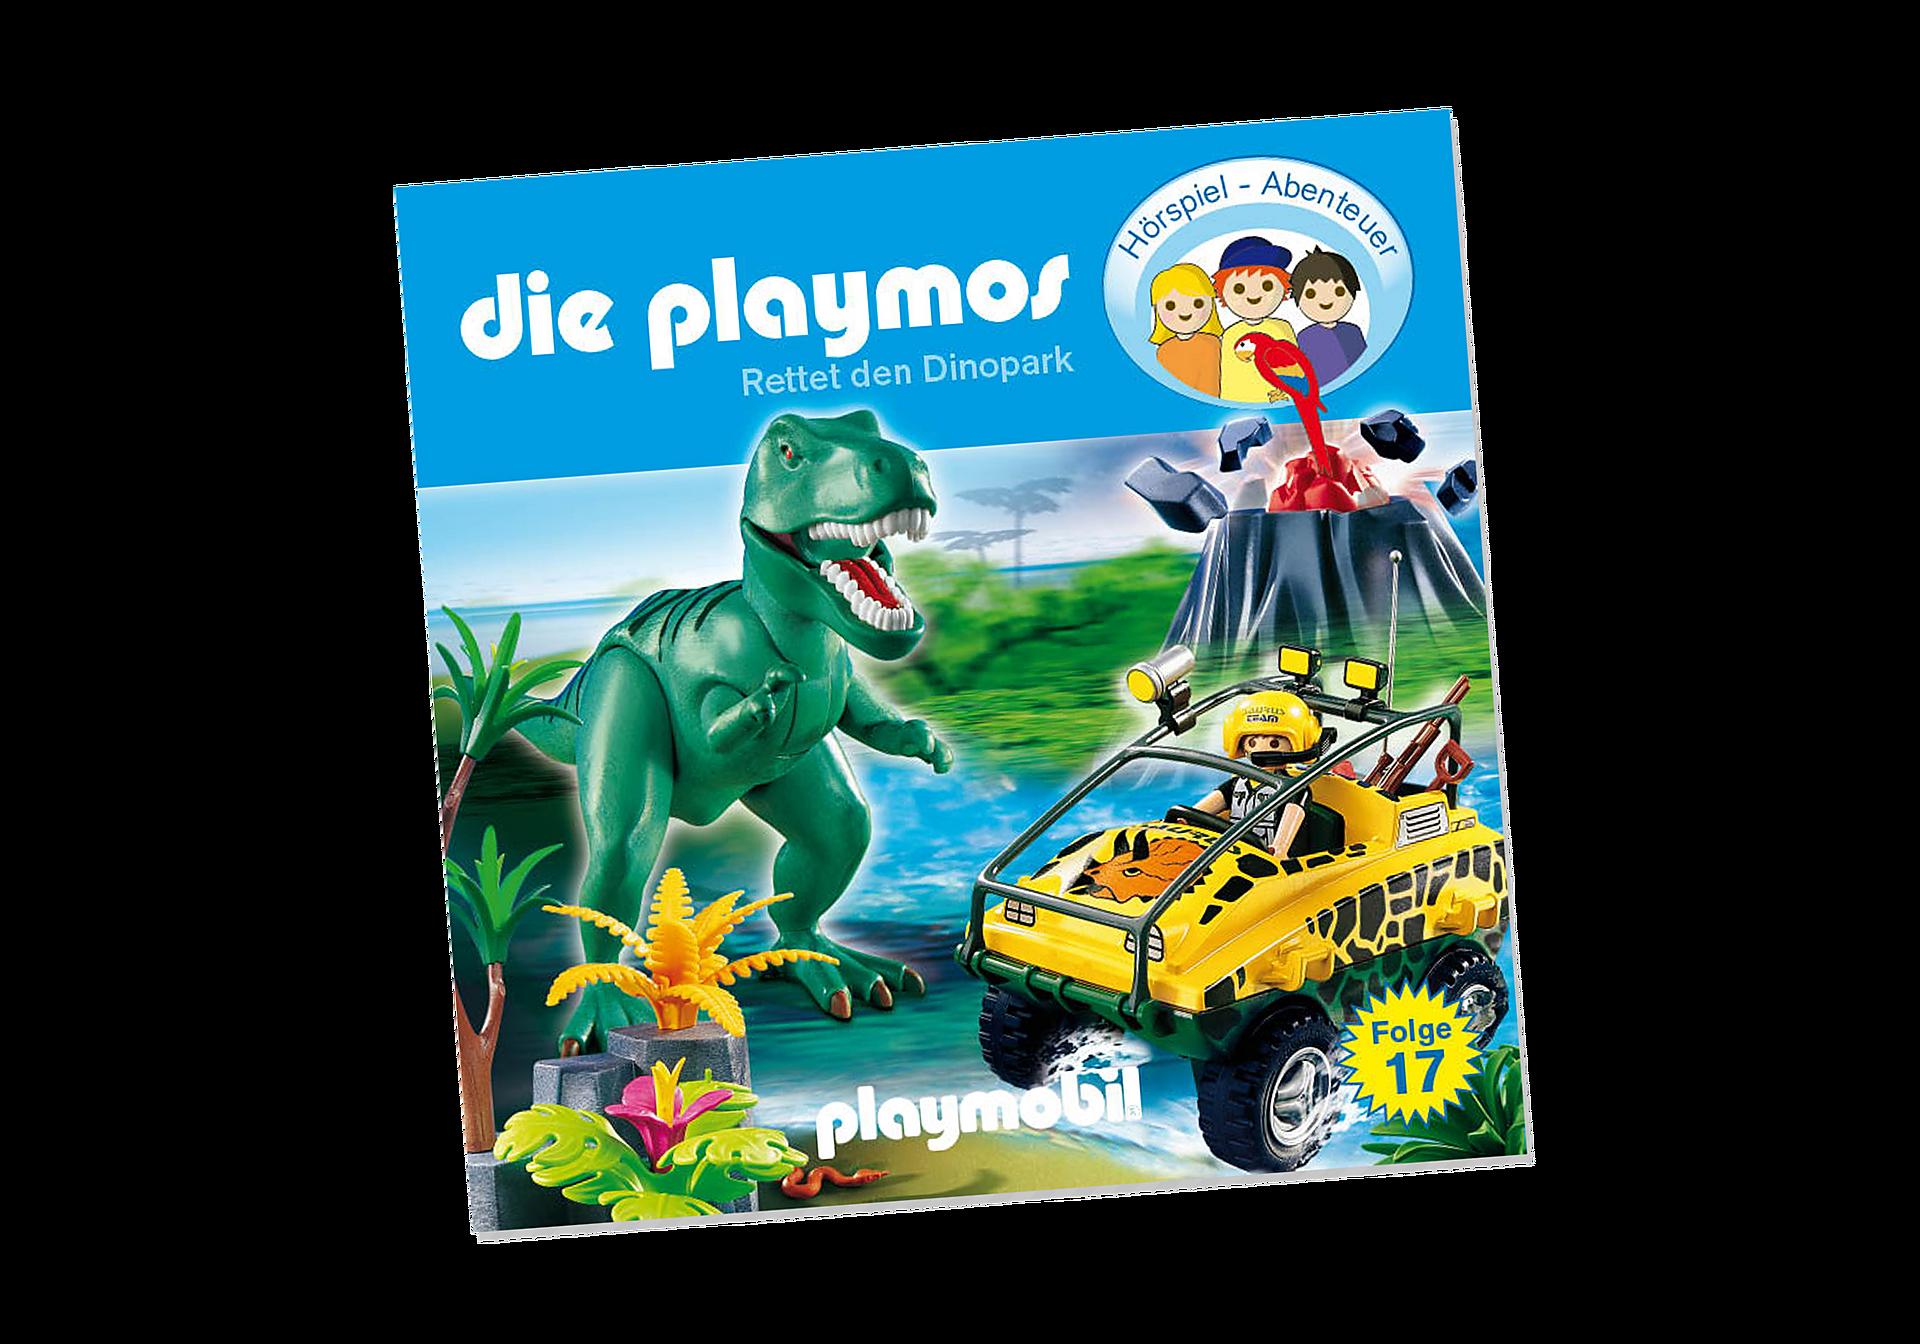 http://media.playmobil.com/i/playmobil/80270_product_detail/Rettet den Dino-Park (17) - CD